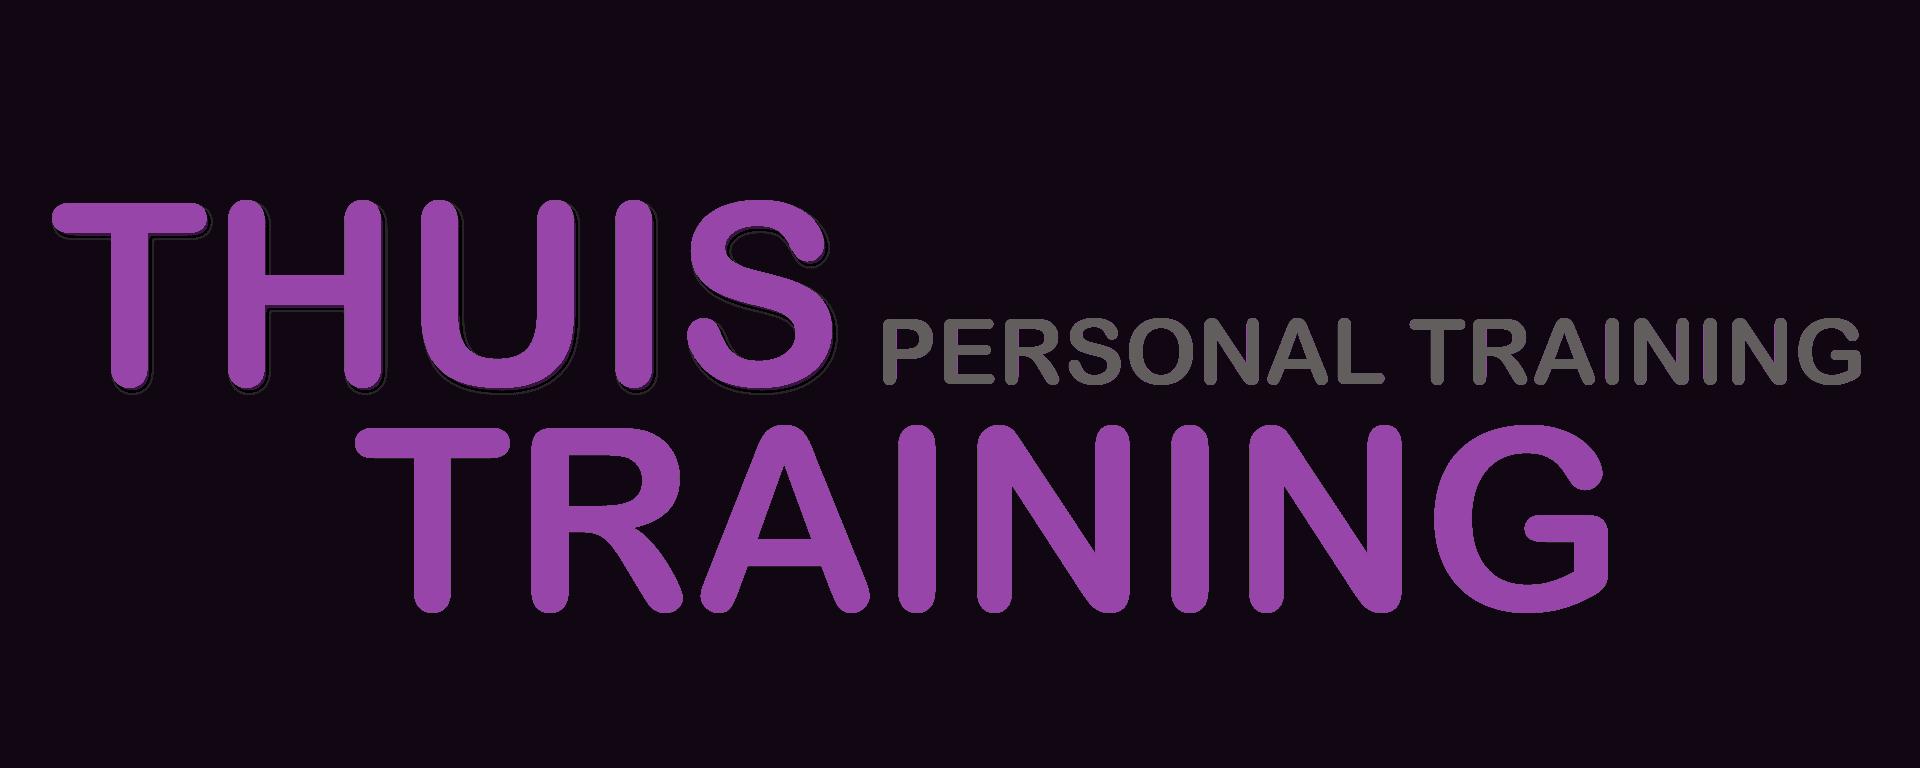 Personal-training-thuis-training